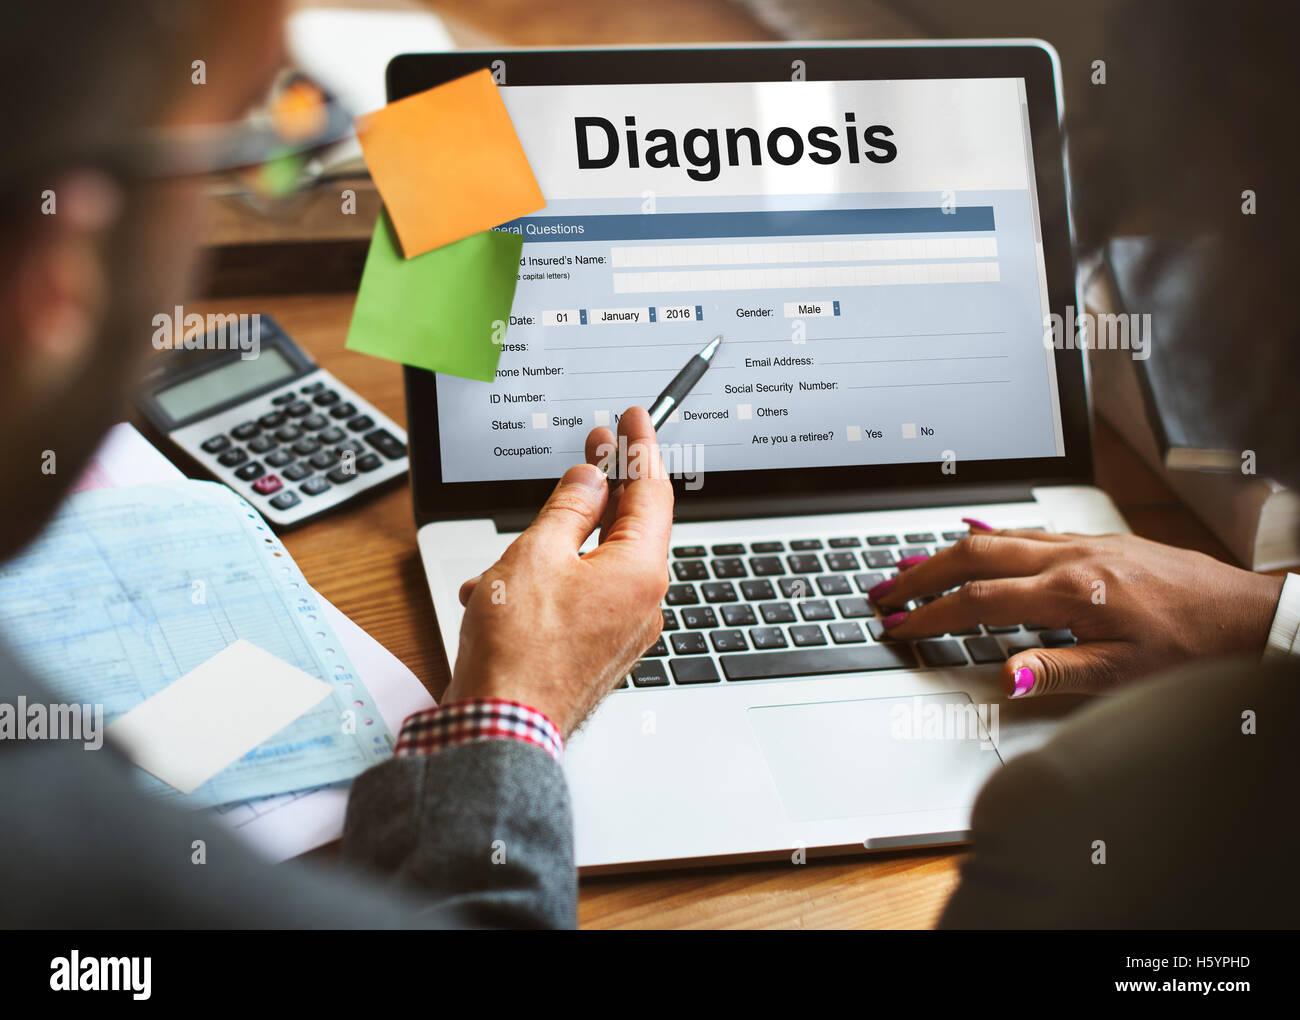 Diagnosis Medical Symptoms Treatment Concept - Stock Image